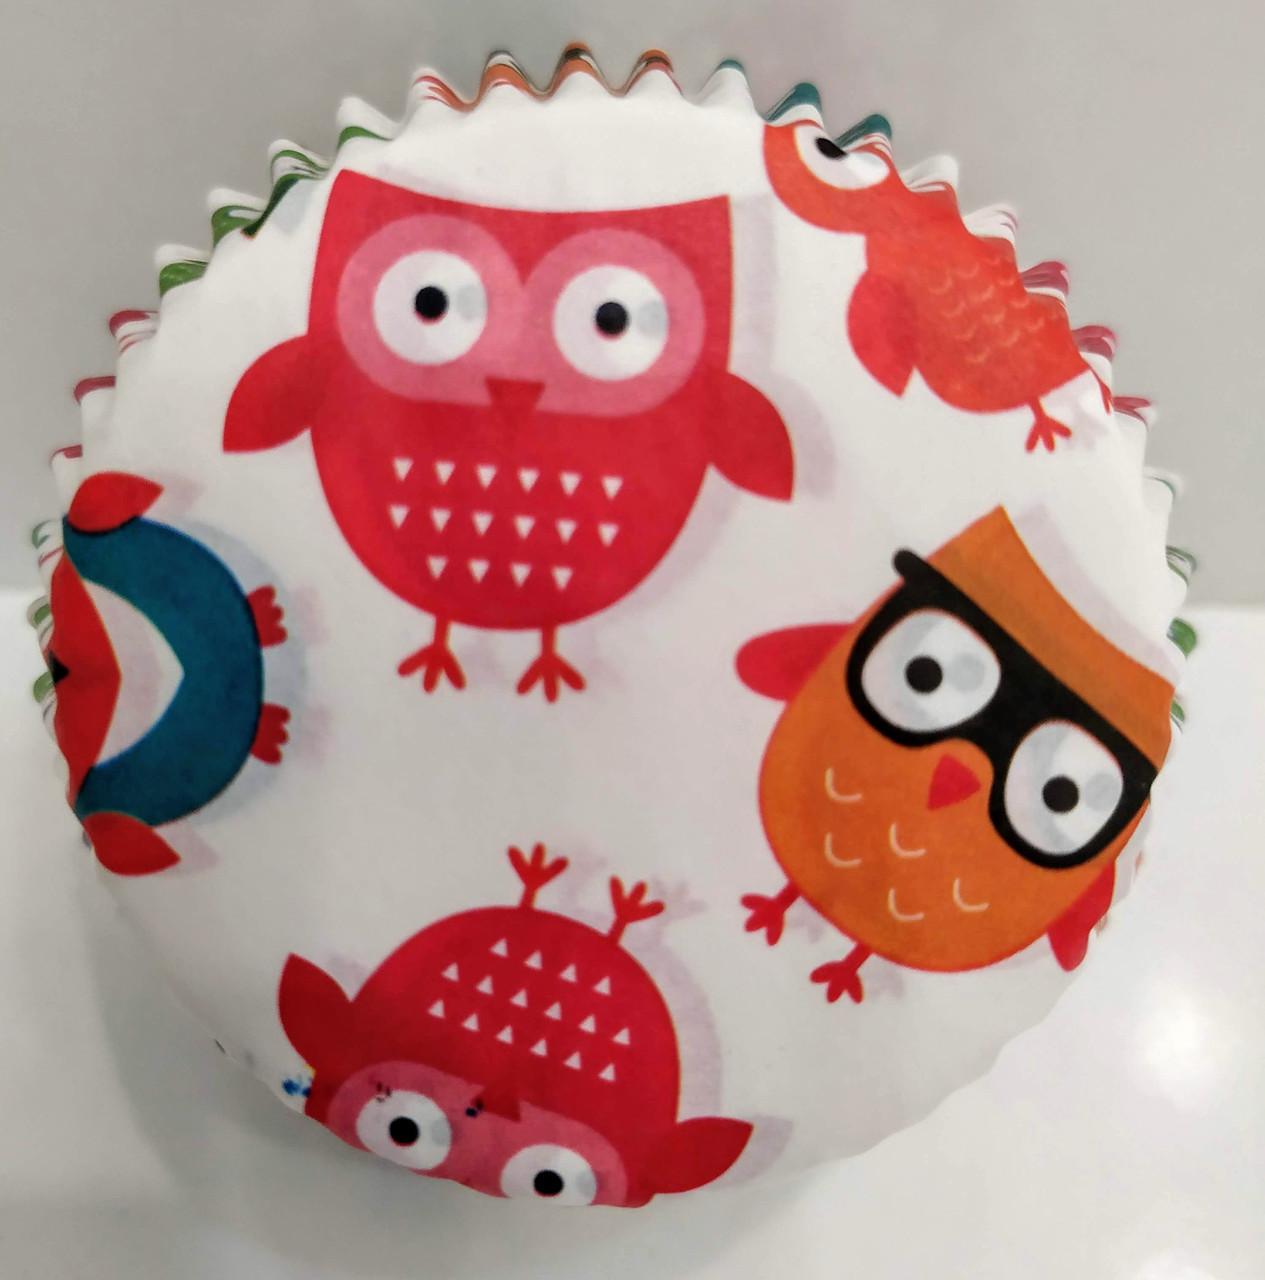 Форма бумажная для кексов Совята тарталетка 1000 шт.